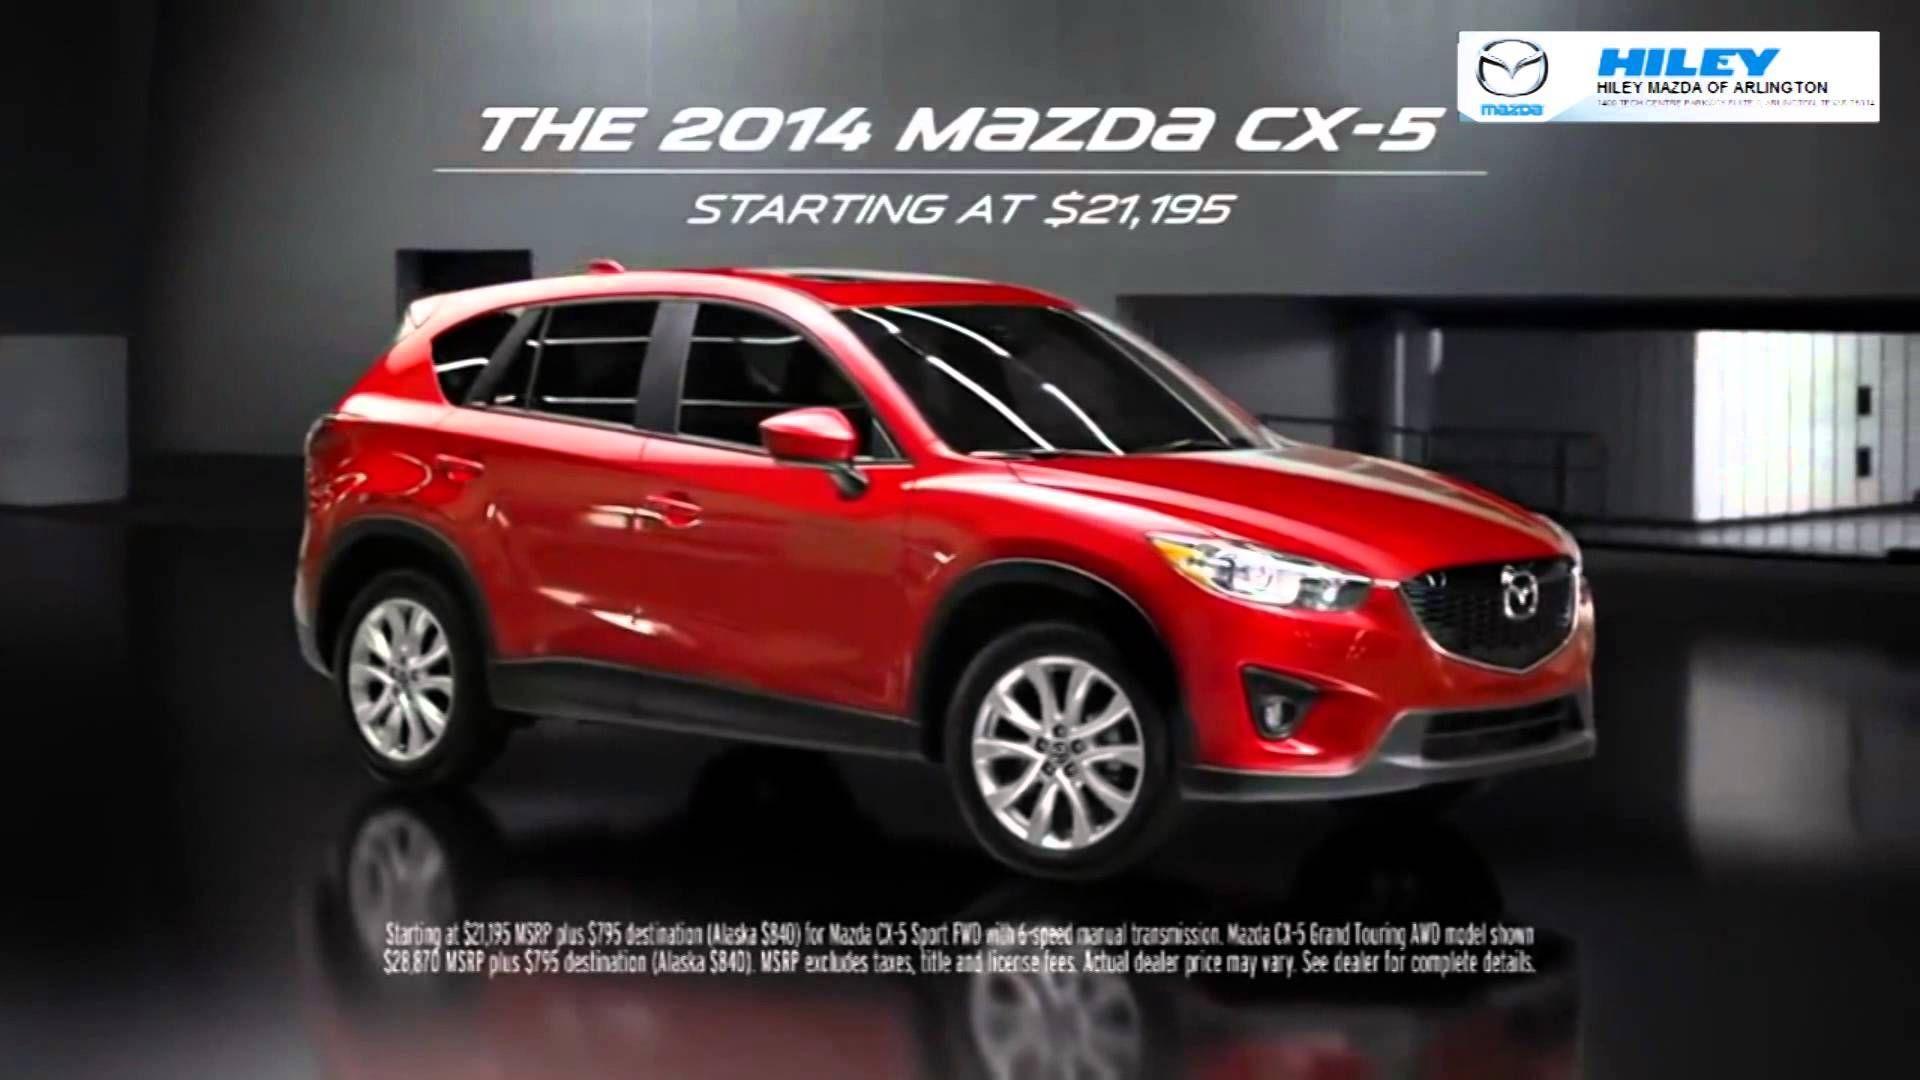 Denton Tx Find 2014 2015 Mazda Cx 5 Dealers Dallas Tx 2014